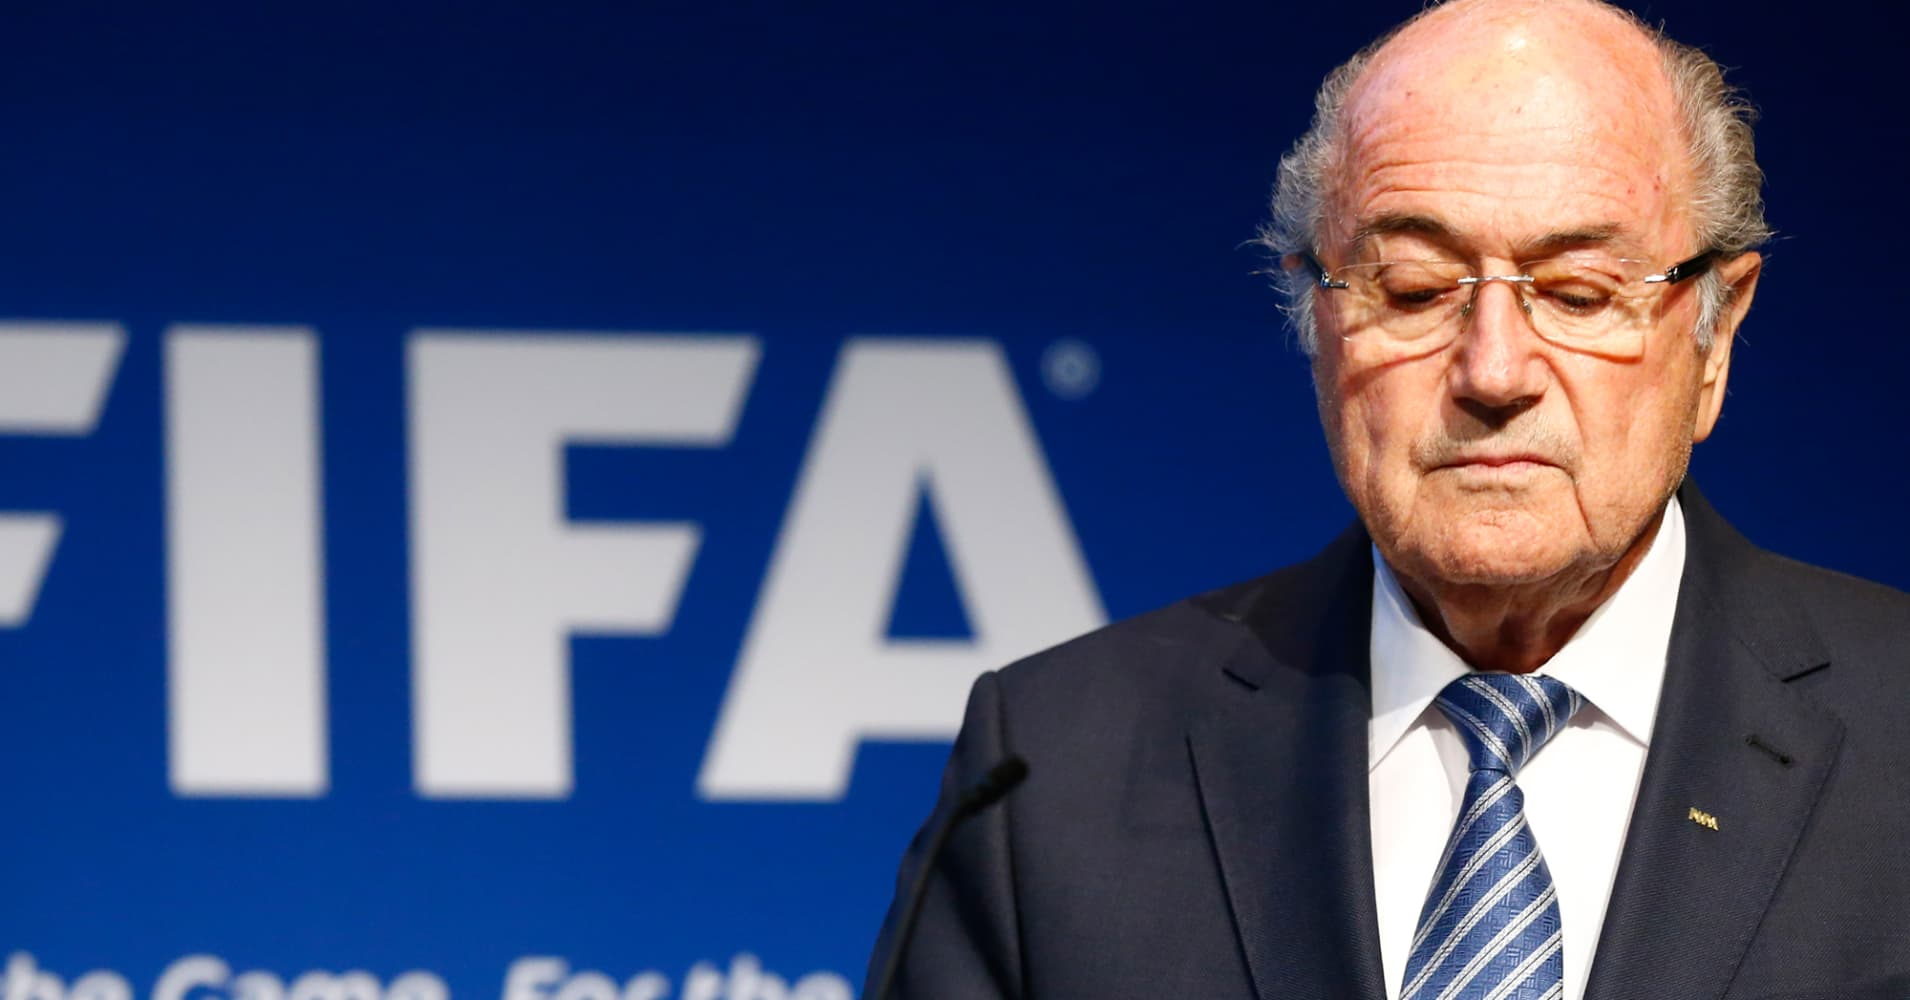 Spécial investigation 2016 – La FIFA, Sepp Blatter et moi